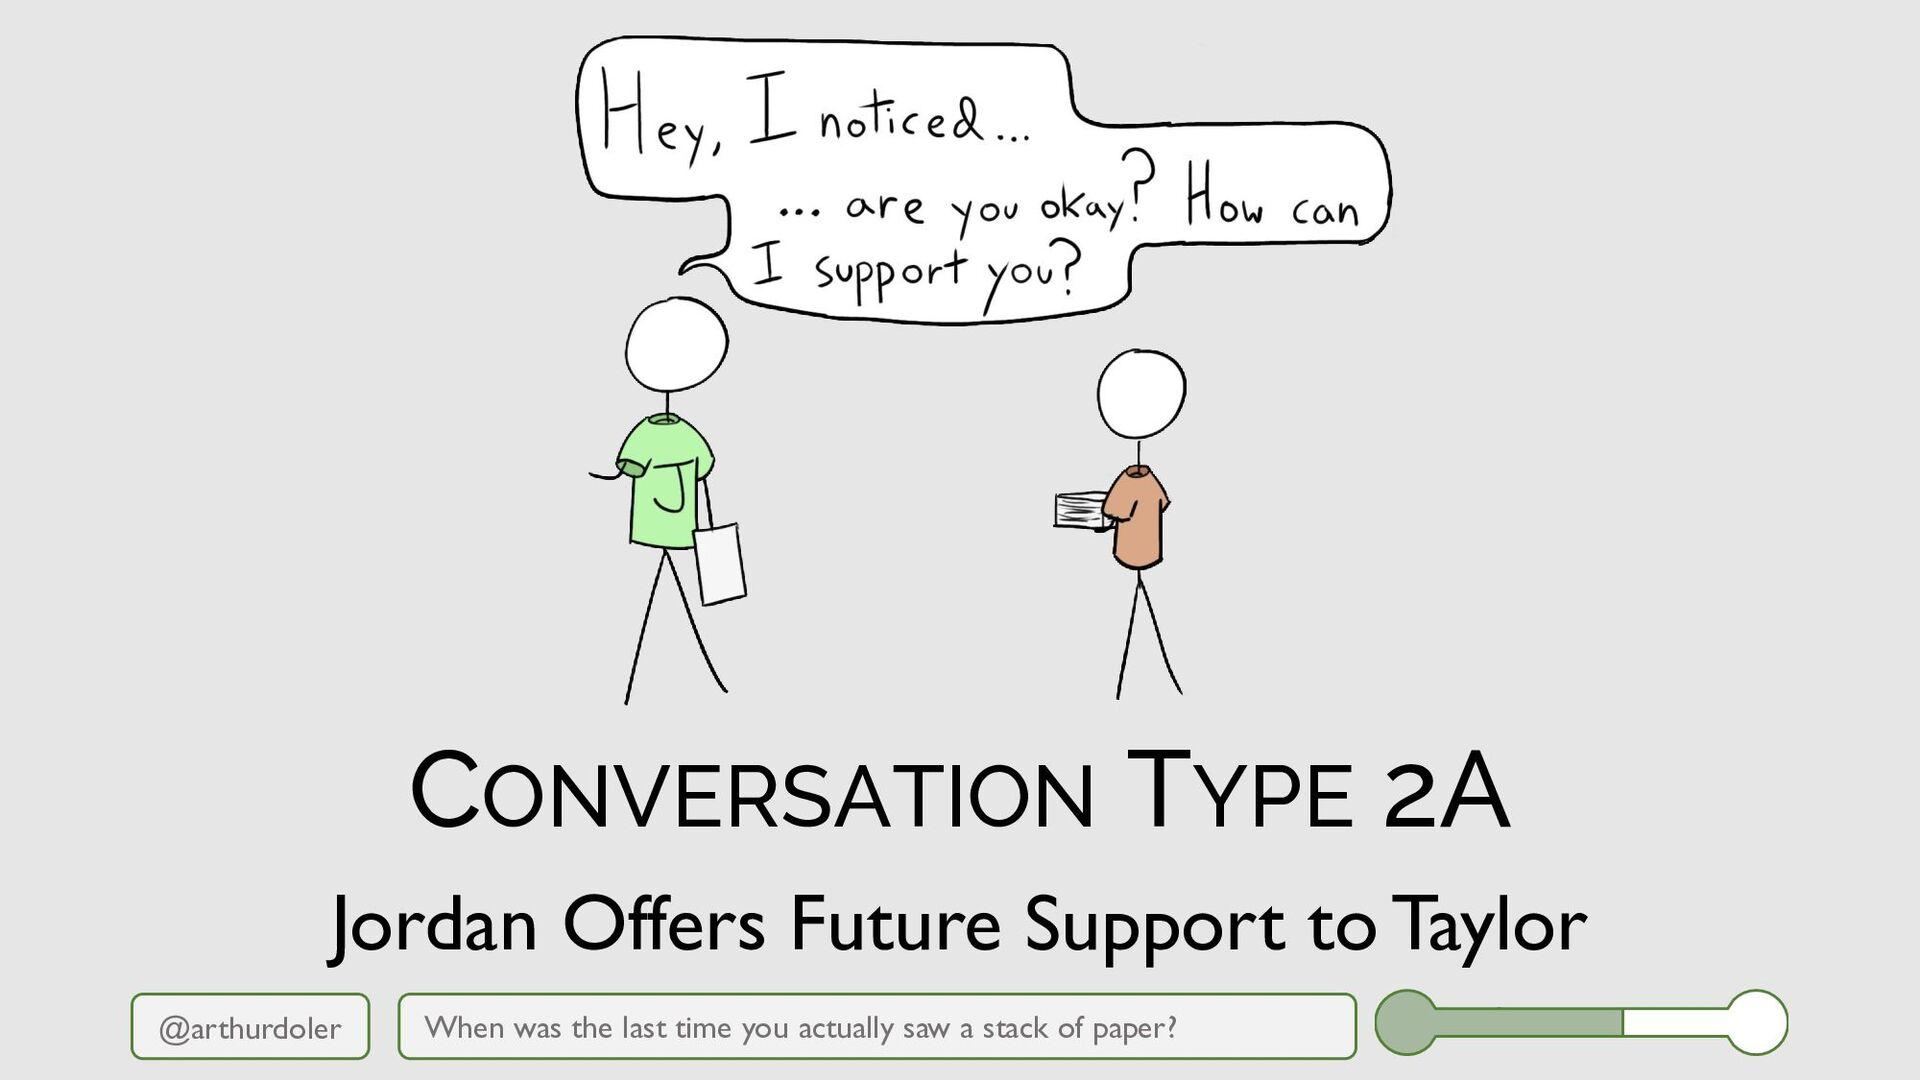 @arthurdoler CONVERSATION TYPE 2A When was the ...